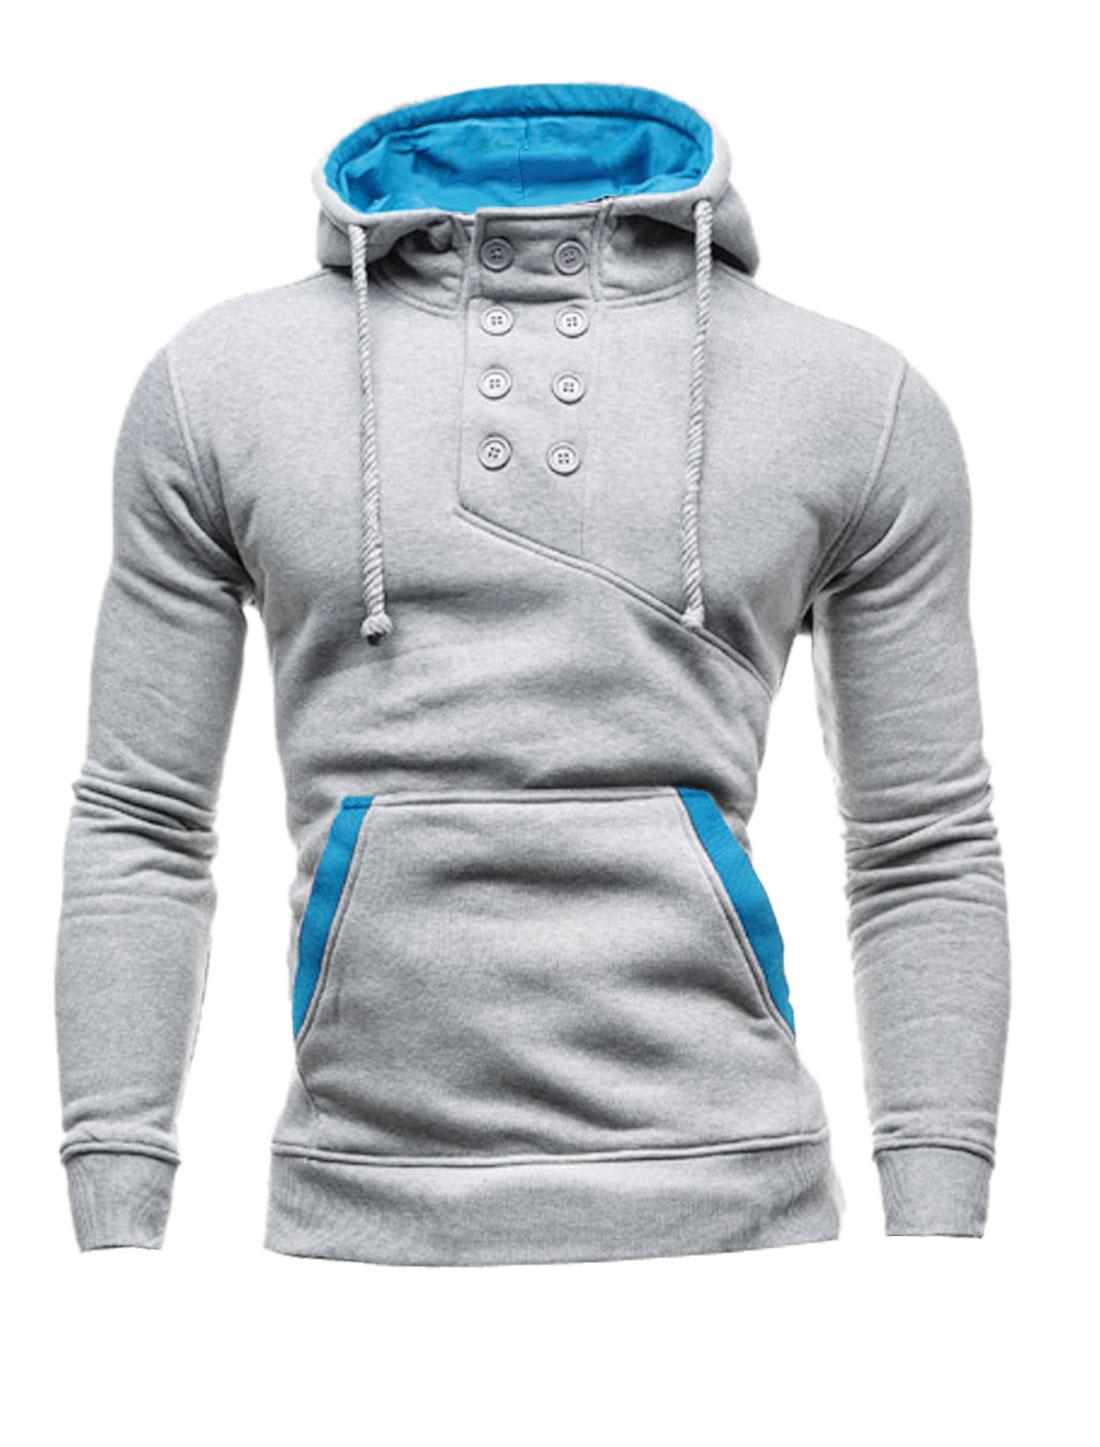 Men Double Breasted Upper Kangaroo Pocket Drawstring Hoodie Light Gray M